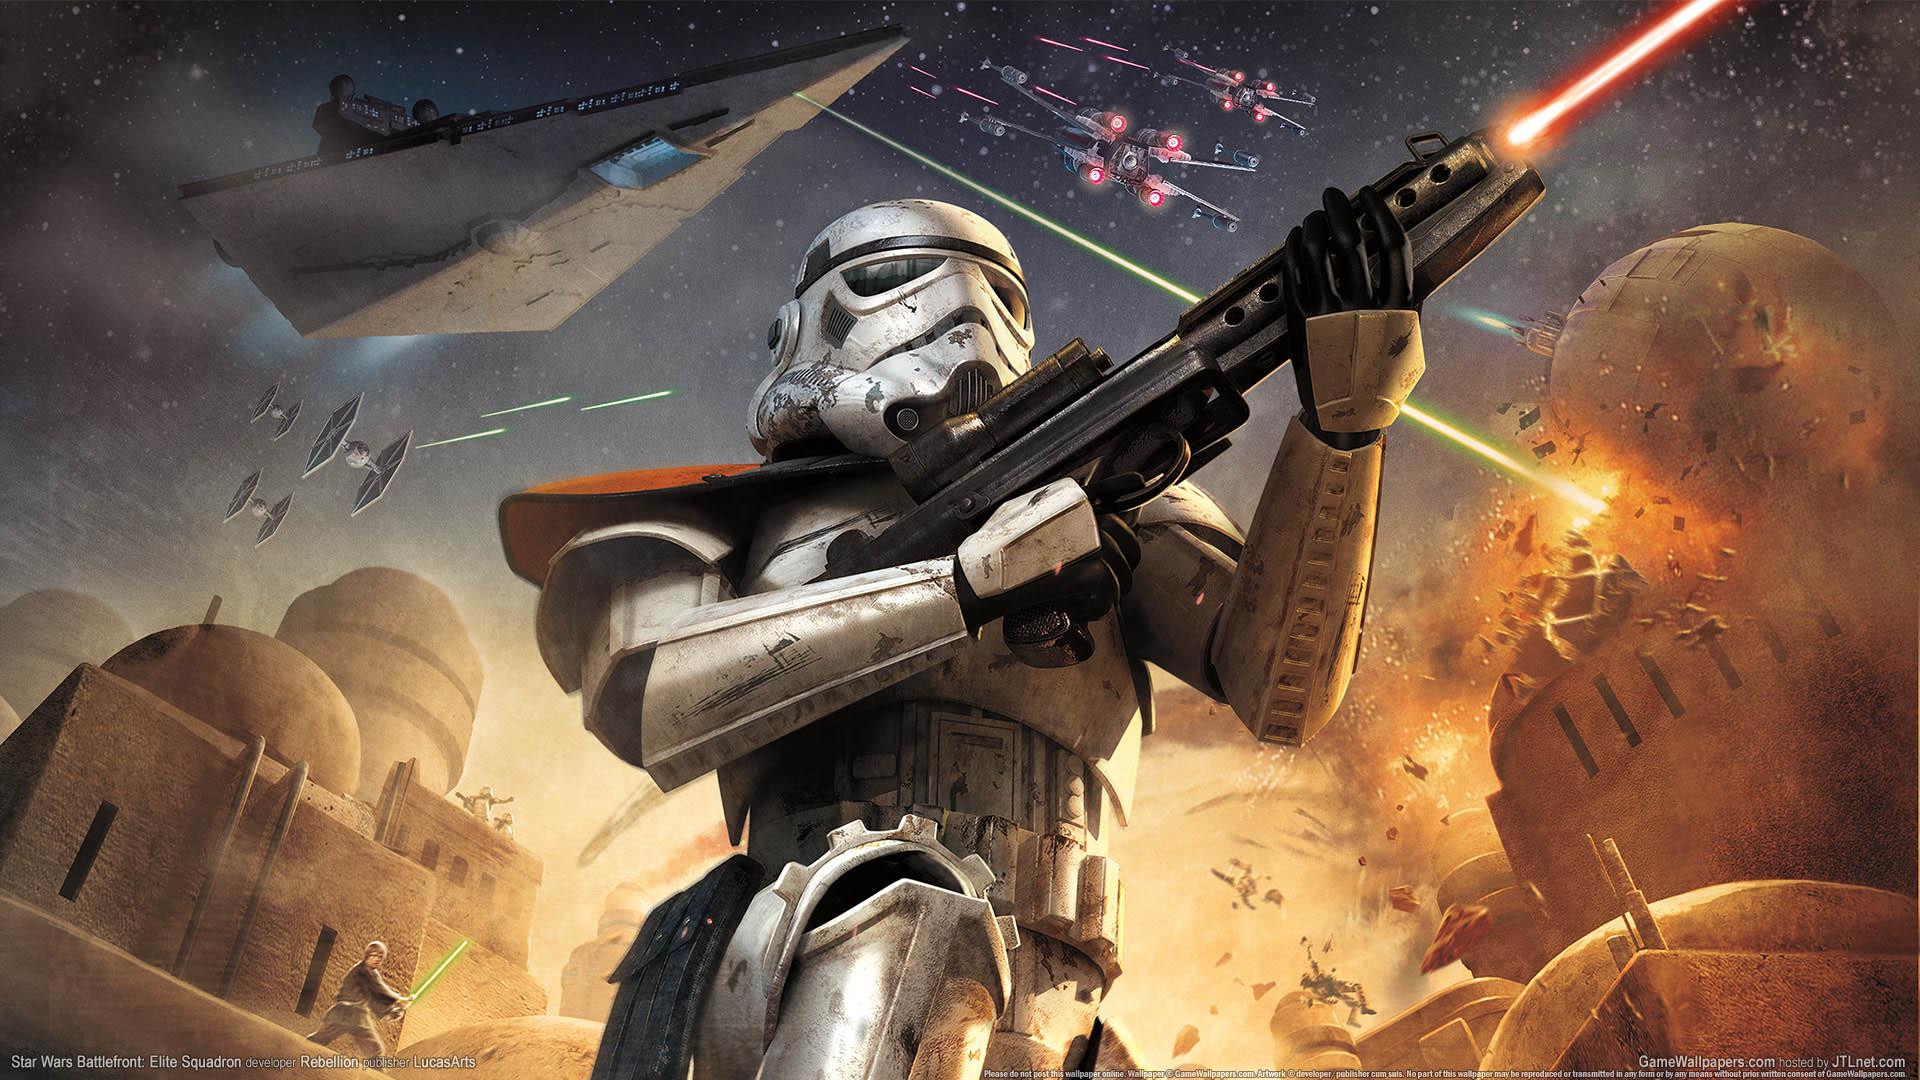 Star Wars Battlefront Elite Squadron Wallpaper 01 1920x1080